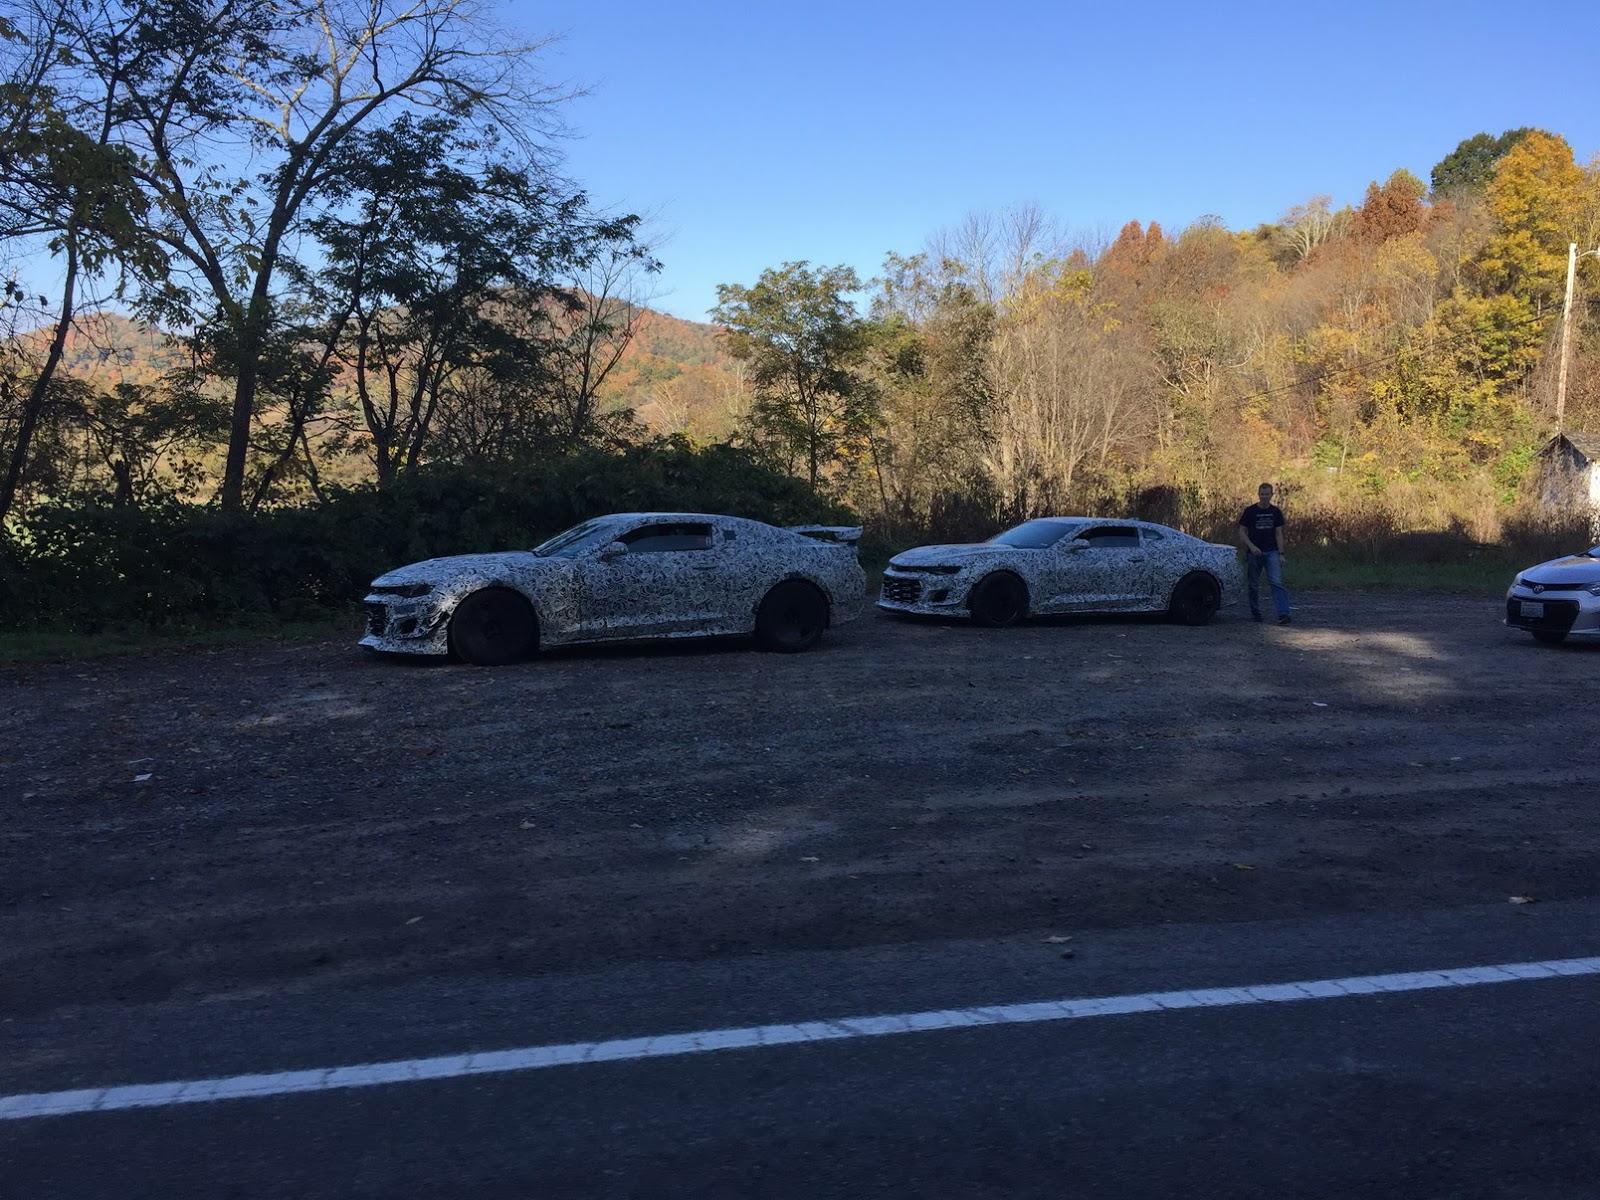 Nuova Chevrolet Camaro Z/28 foto spia 19 ottobre 2016